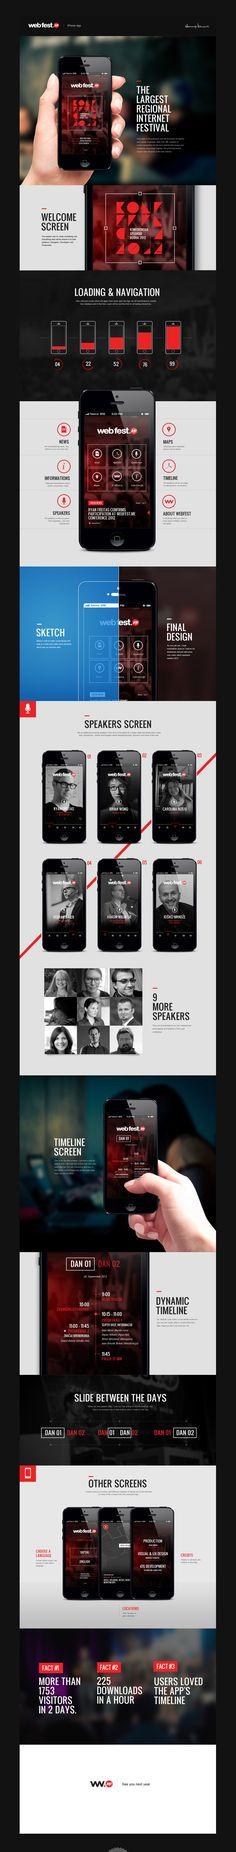 WebFest - #iPhone #App by Nemanja Ivanovic, via Behance #webdesign #mobile #ui